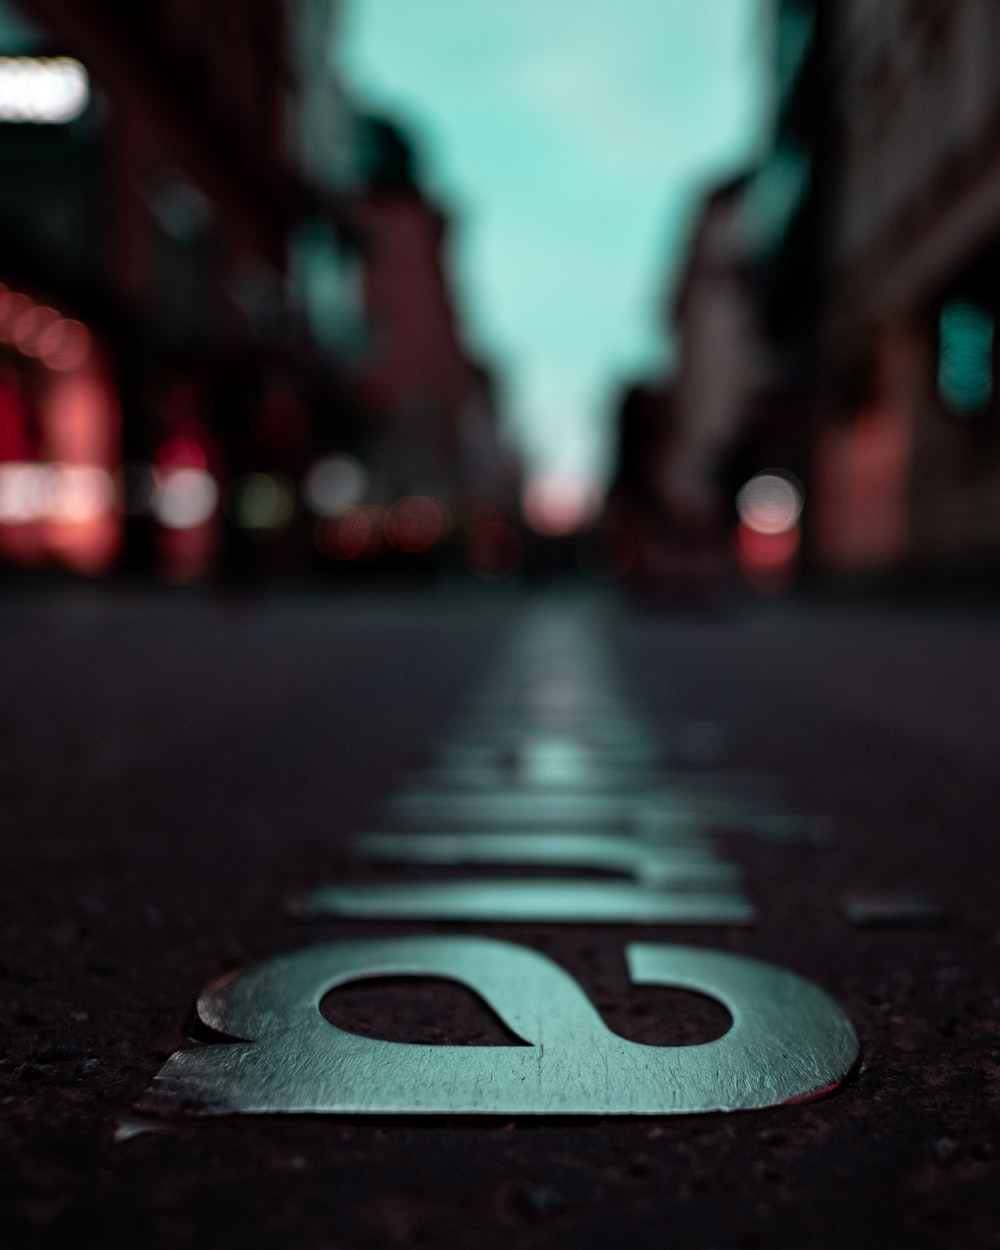 selective focus photography of silver-colored emblem on concrete pavement